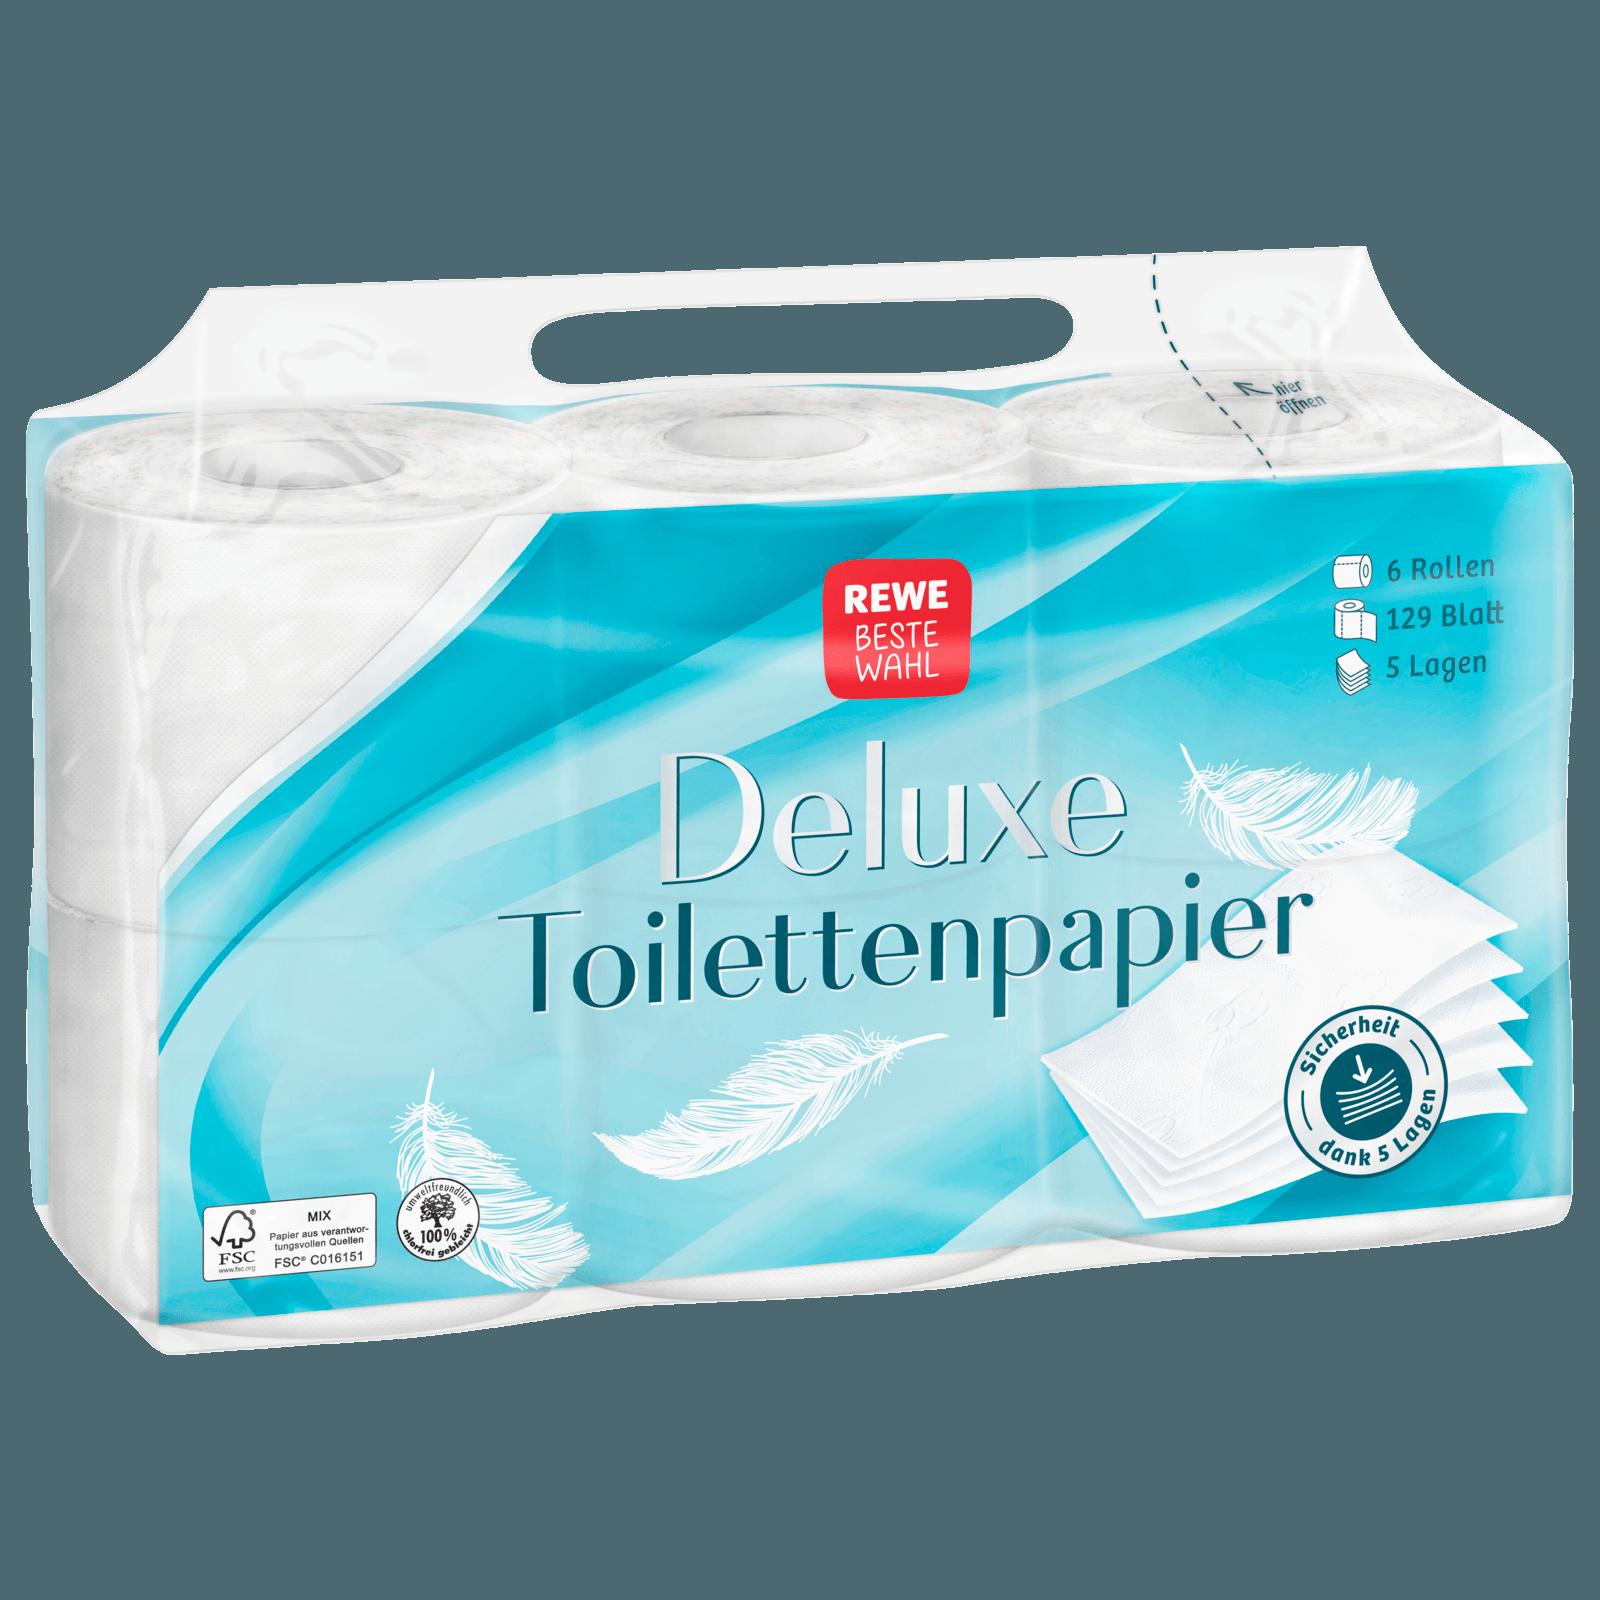 REWE Beste Wahl Deluxe-Toilettenpapier 5-lagig 6x129 Blatt